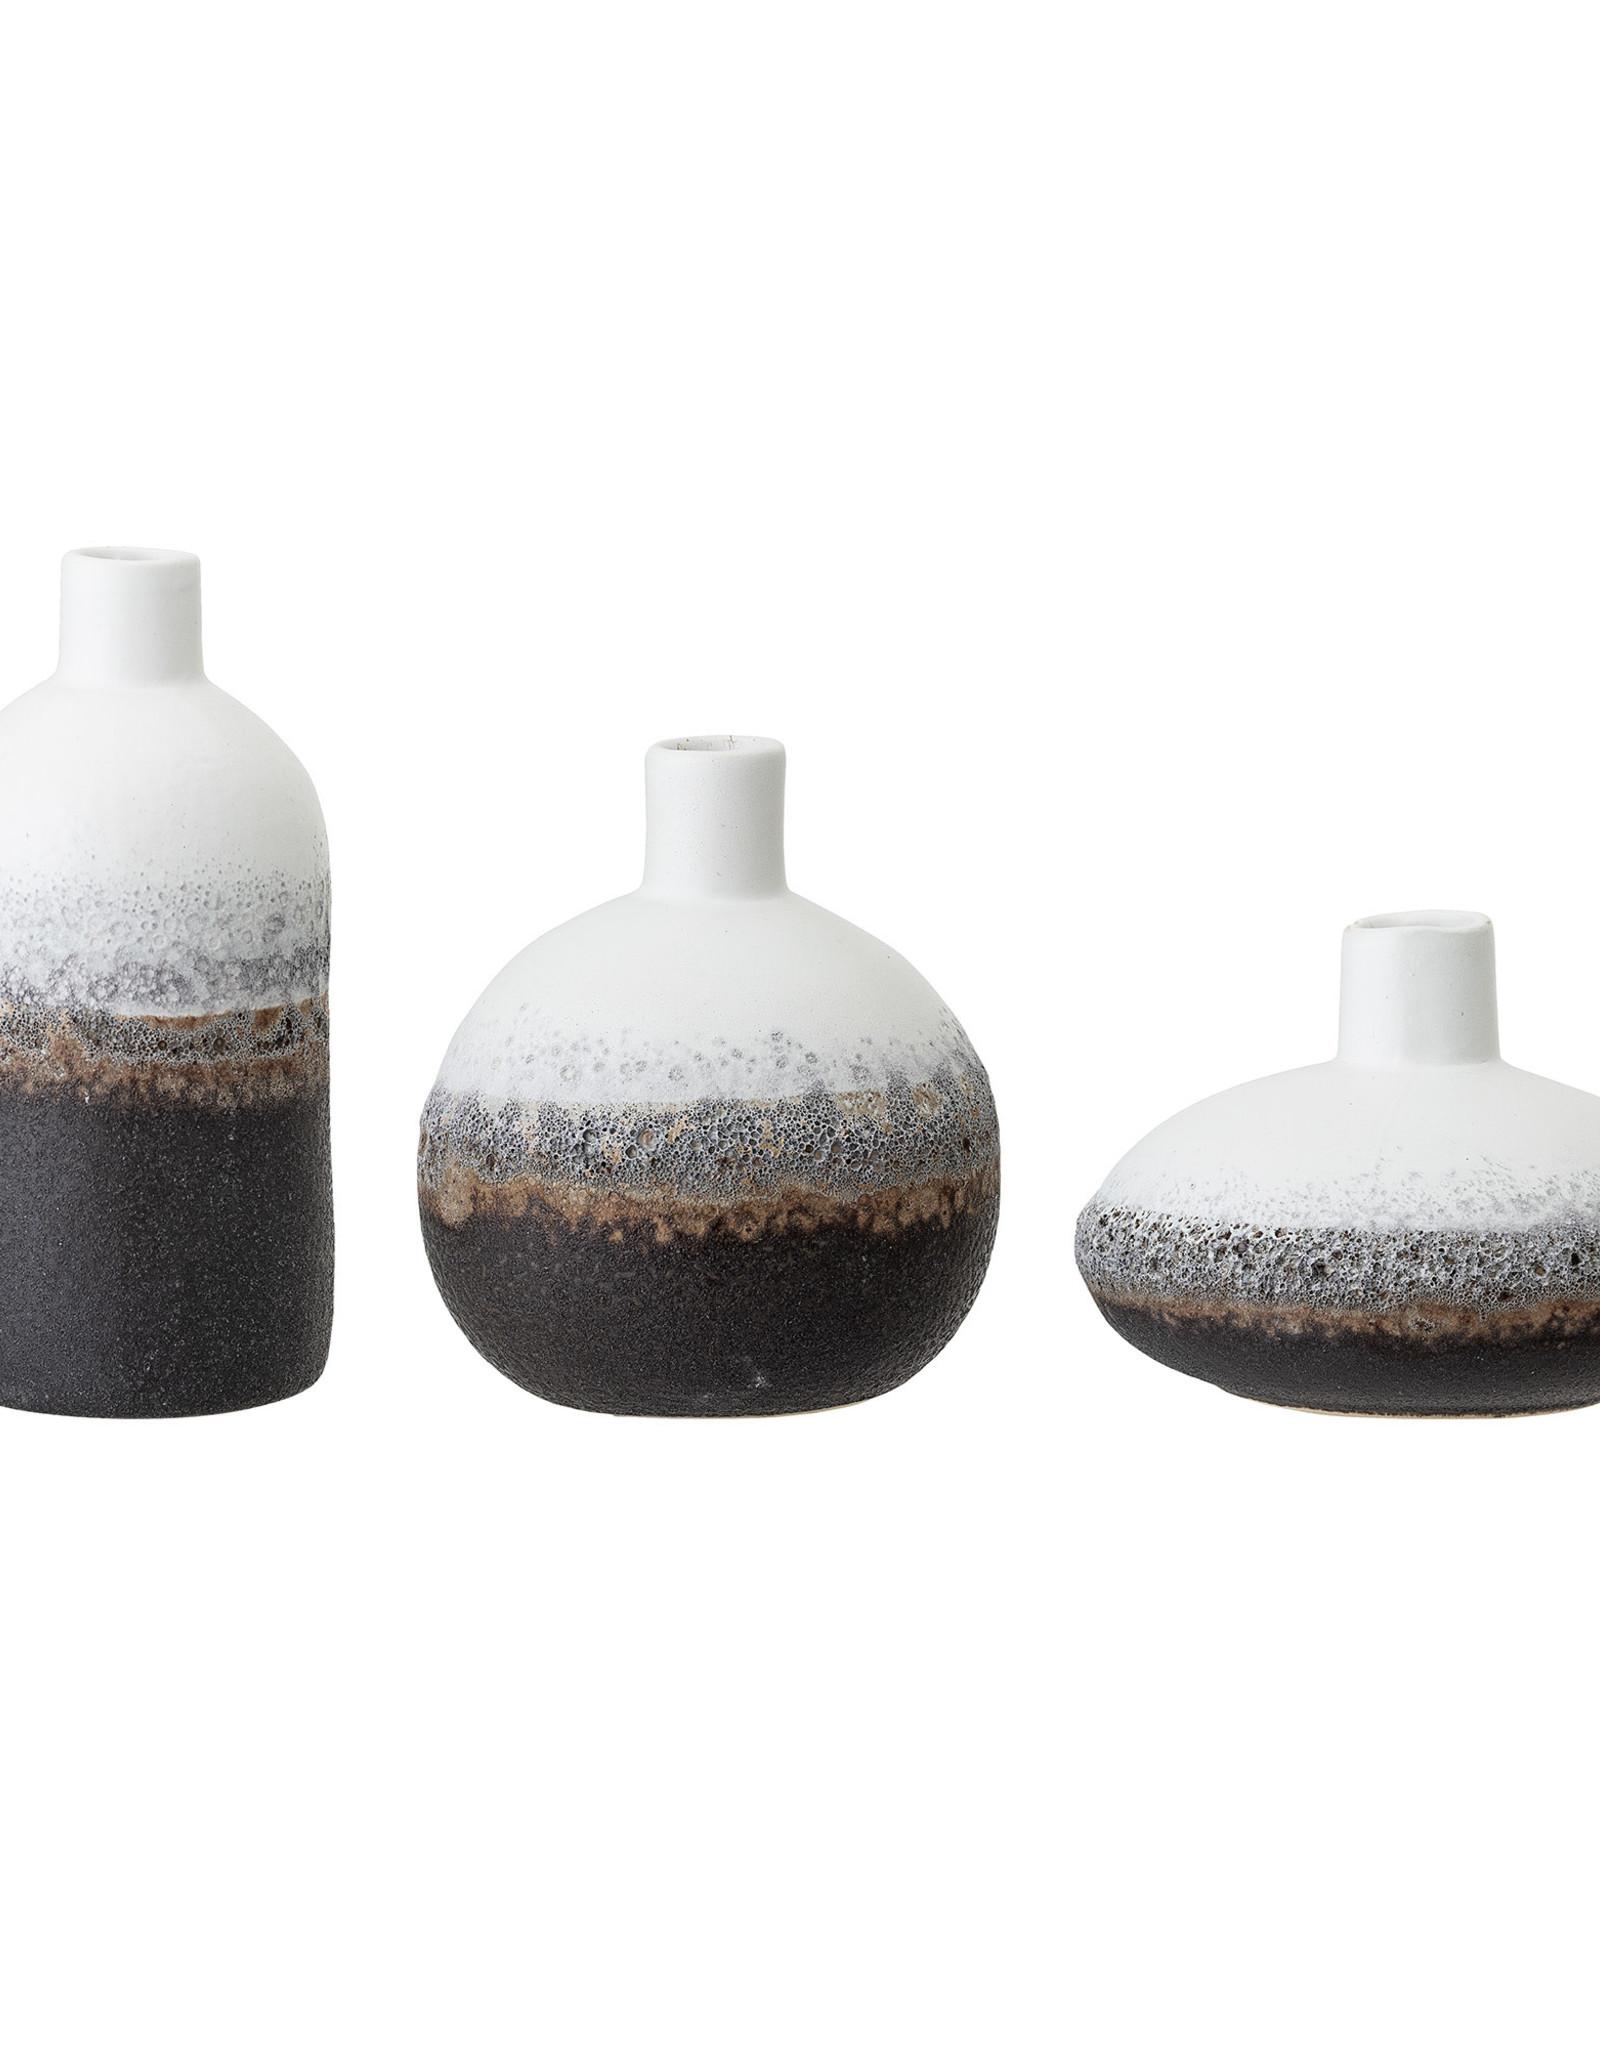 Bloomingville Bloomingville - vase stoneware mini vase white/ brown